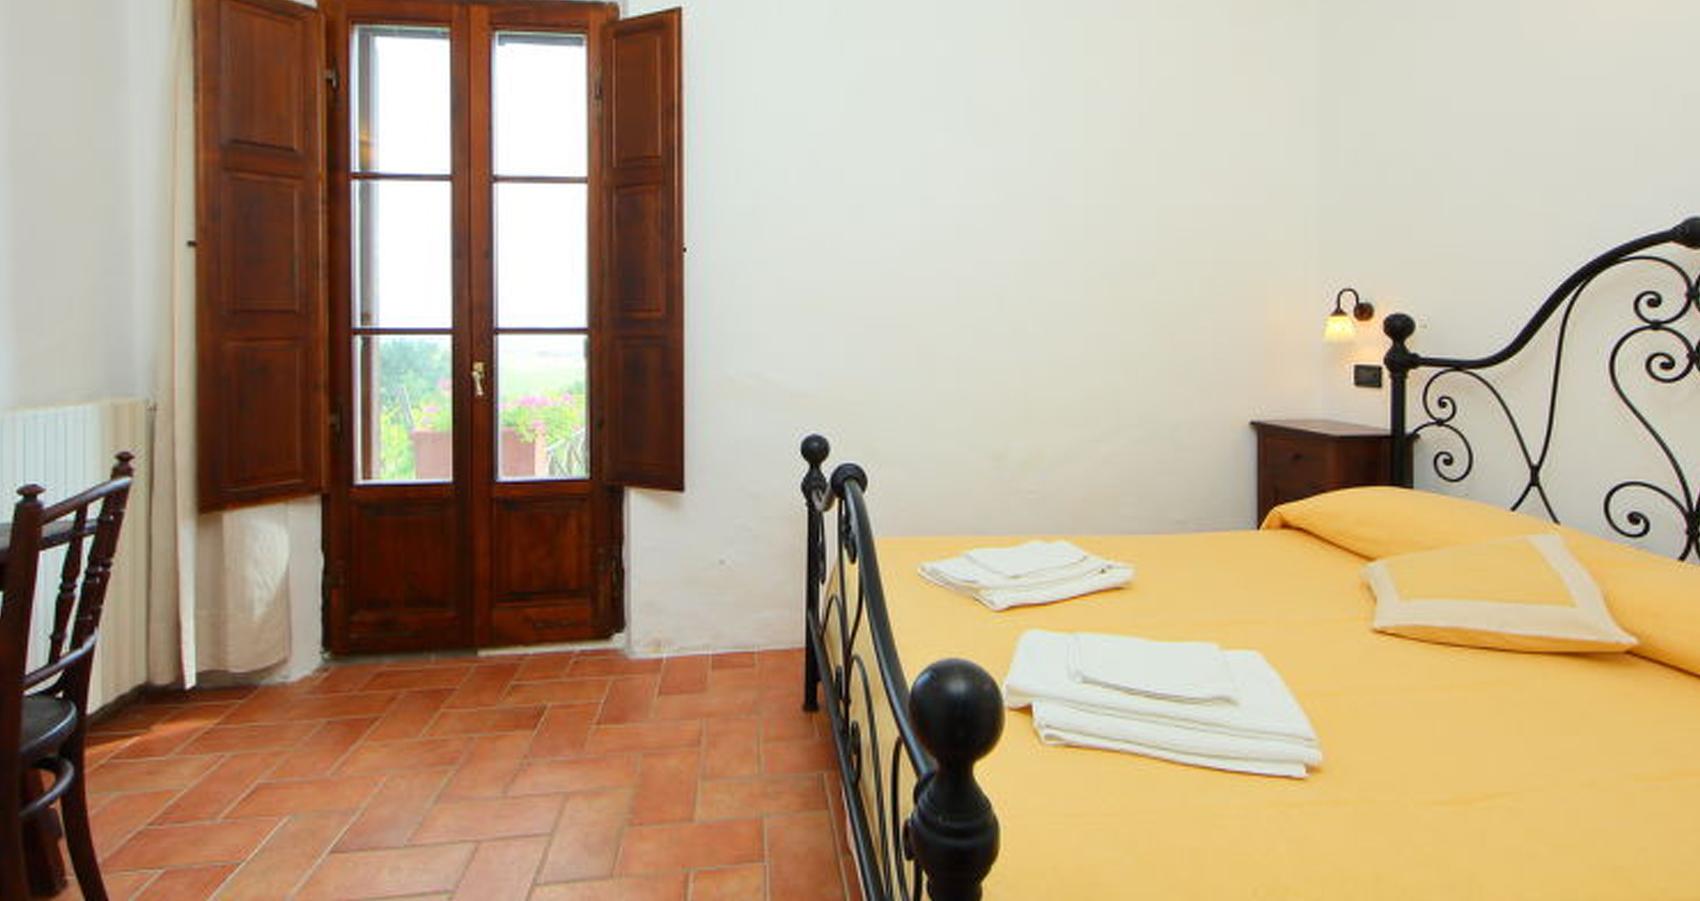 Camere Podere San Giuseppe Radicofani Agriturismo Siena